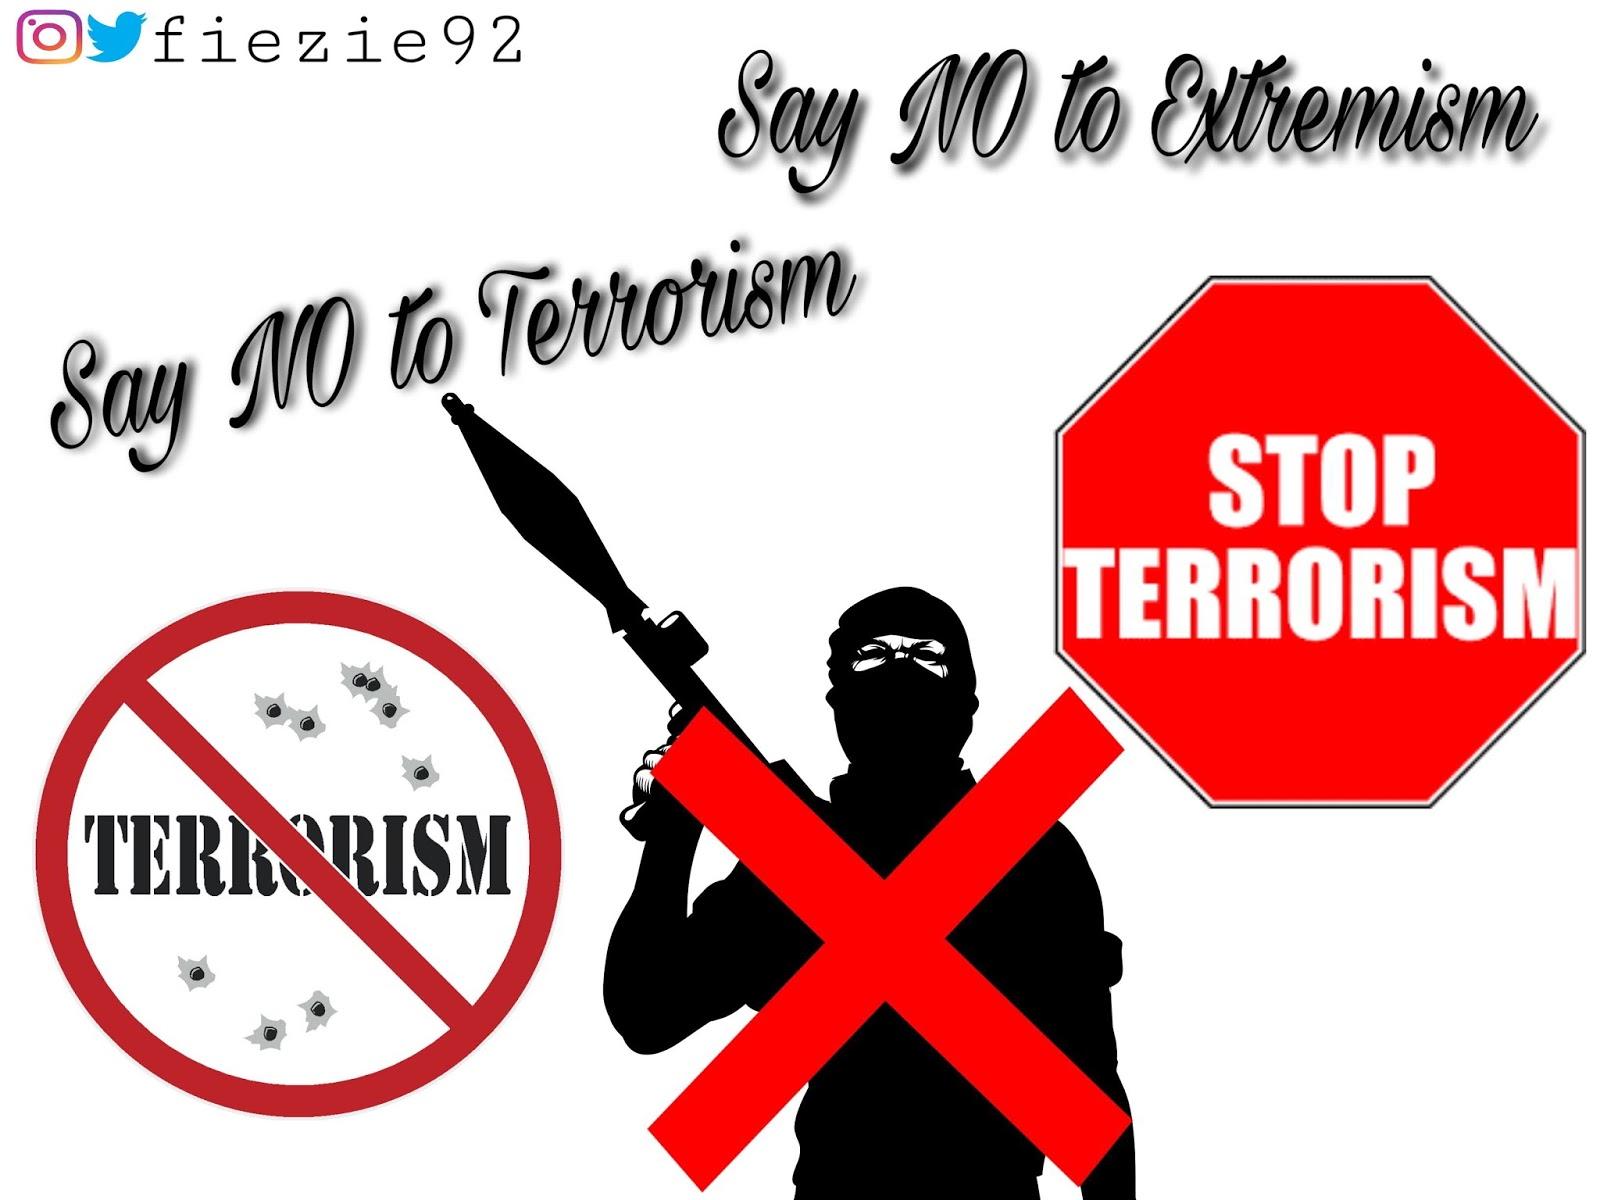 Say NO to terrorism, Say NO to extremism